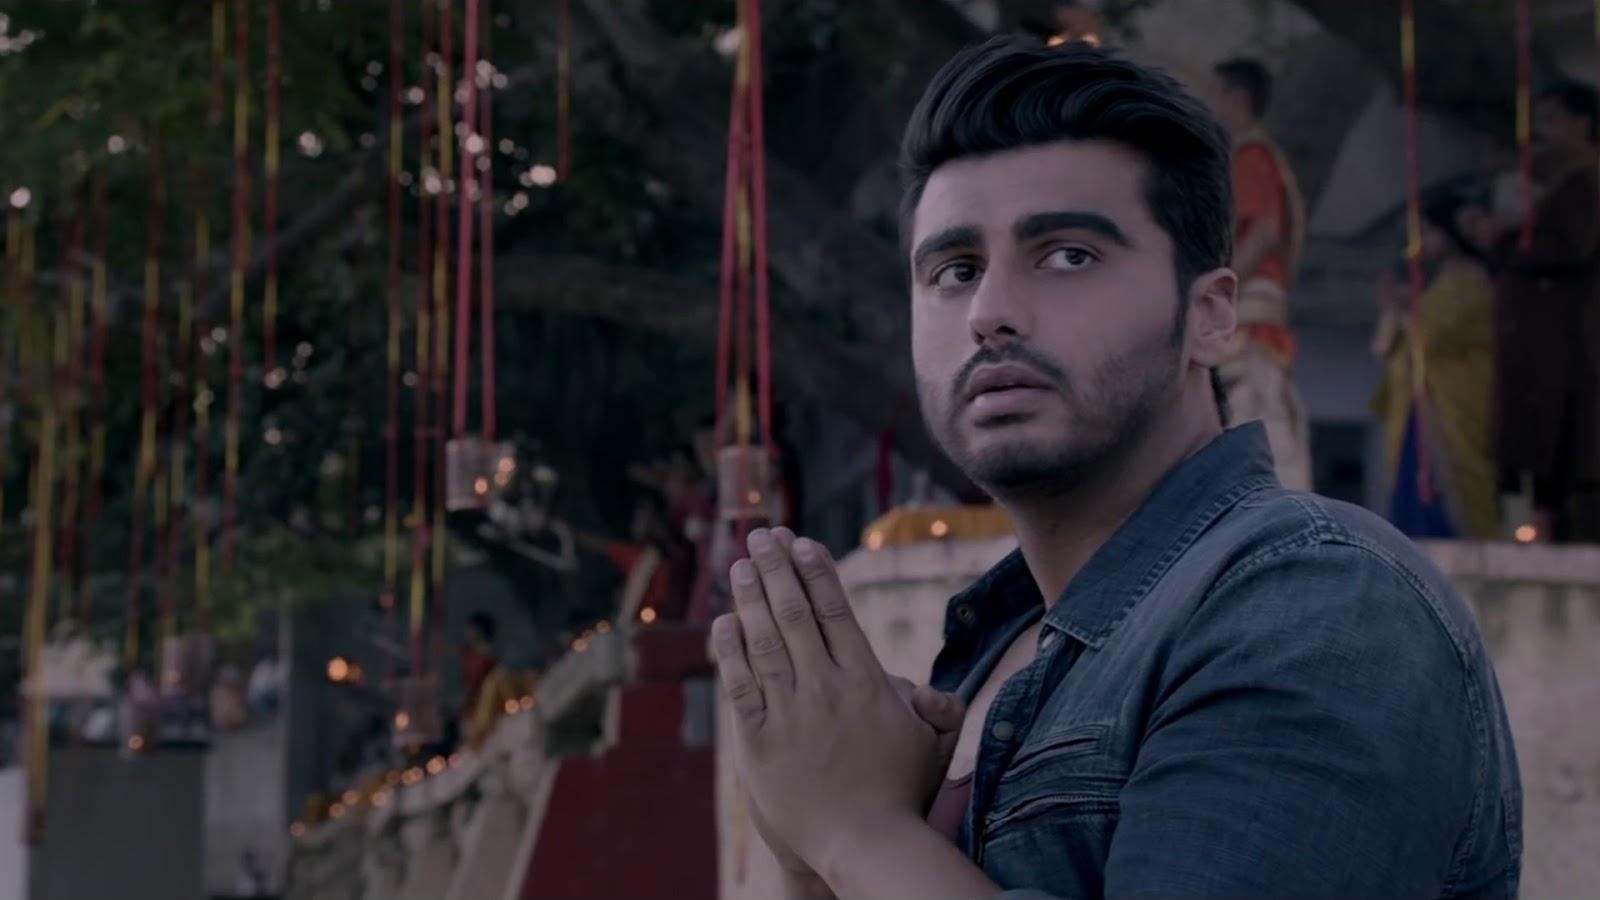 Download cute arjun kapoor smile hd wallpaper latest hd wallpaper - Arjun Kapoor Pray Image In Half Girlfriend Film